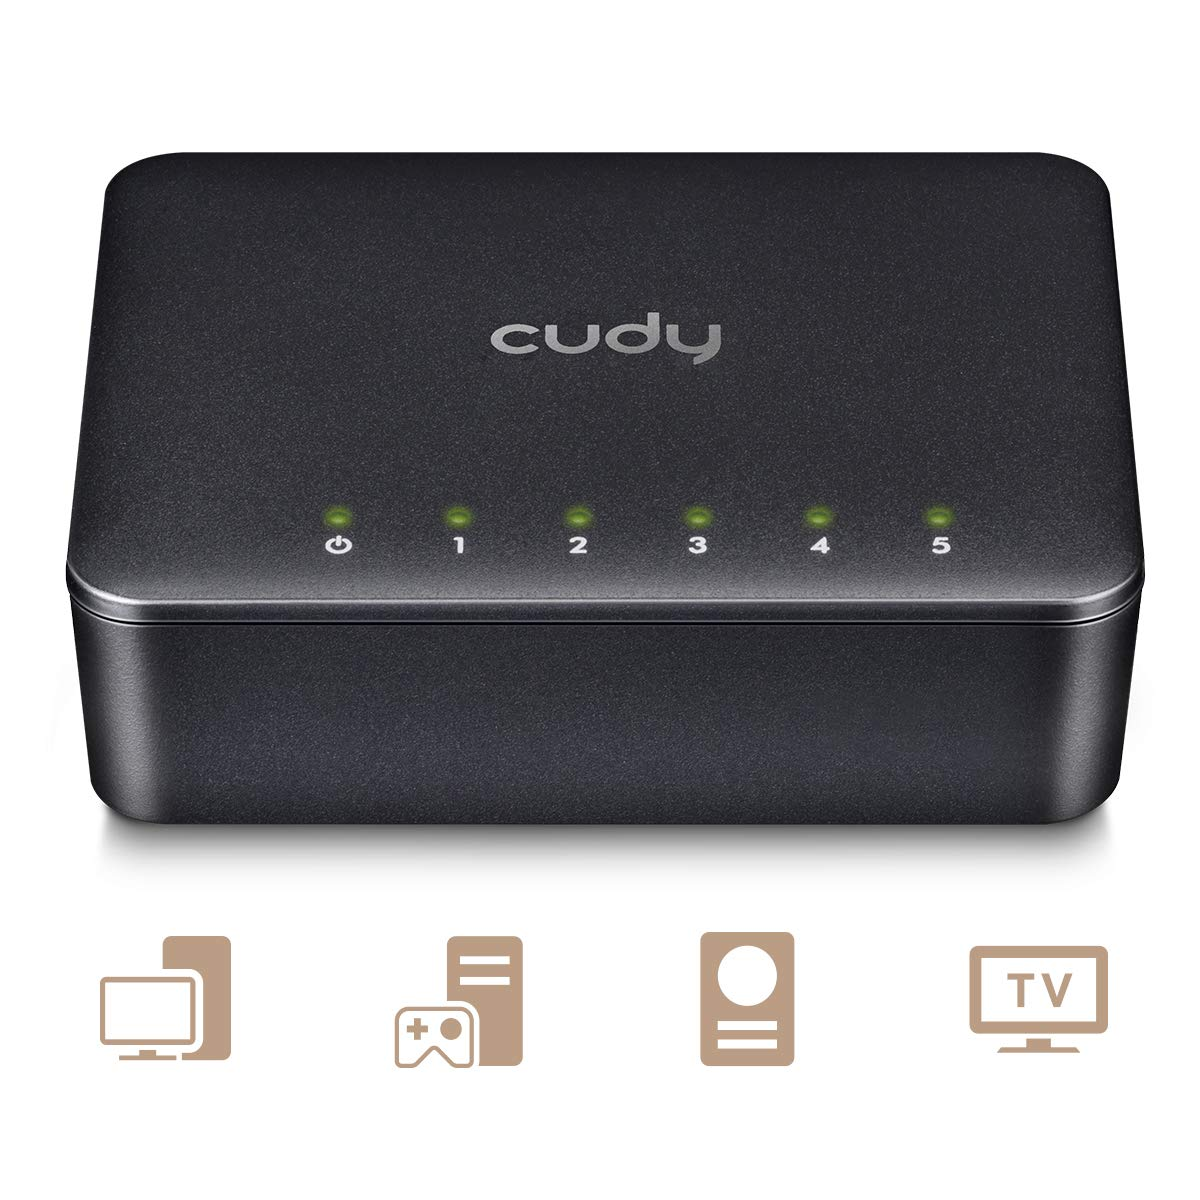 Plug /& Play Gigabit Switch 5-Port Cudy GS105D 5 Port LAN Switch Gigabit LAN Verteiler Netzwerk Switch 5 * 10//100//1000Mbit//s RJ45